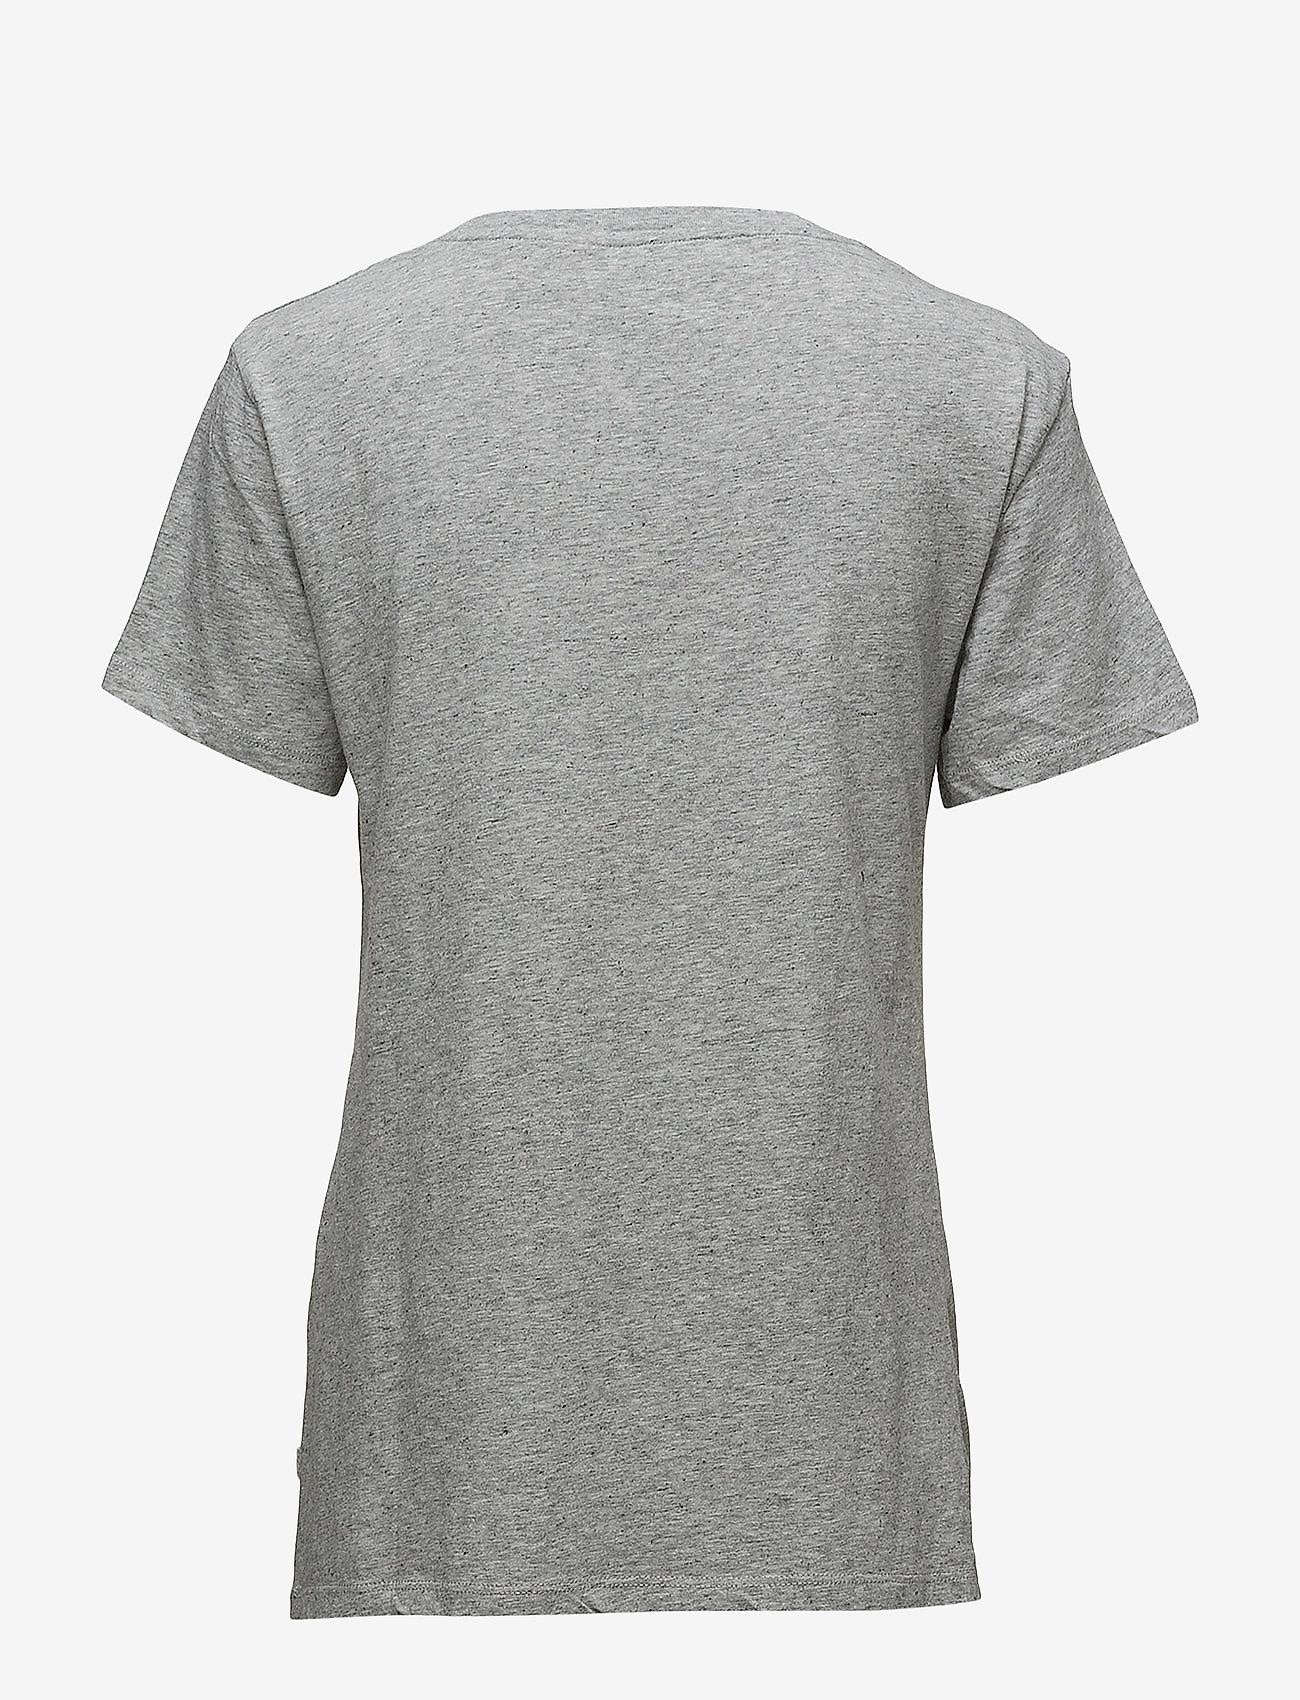 LEVI´S Women - THE PERFECT TEE SPORTSWEAR LOG - t-shirts - greys - 1